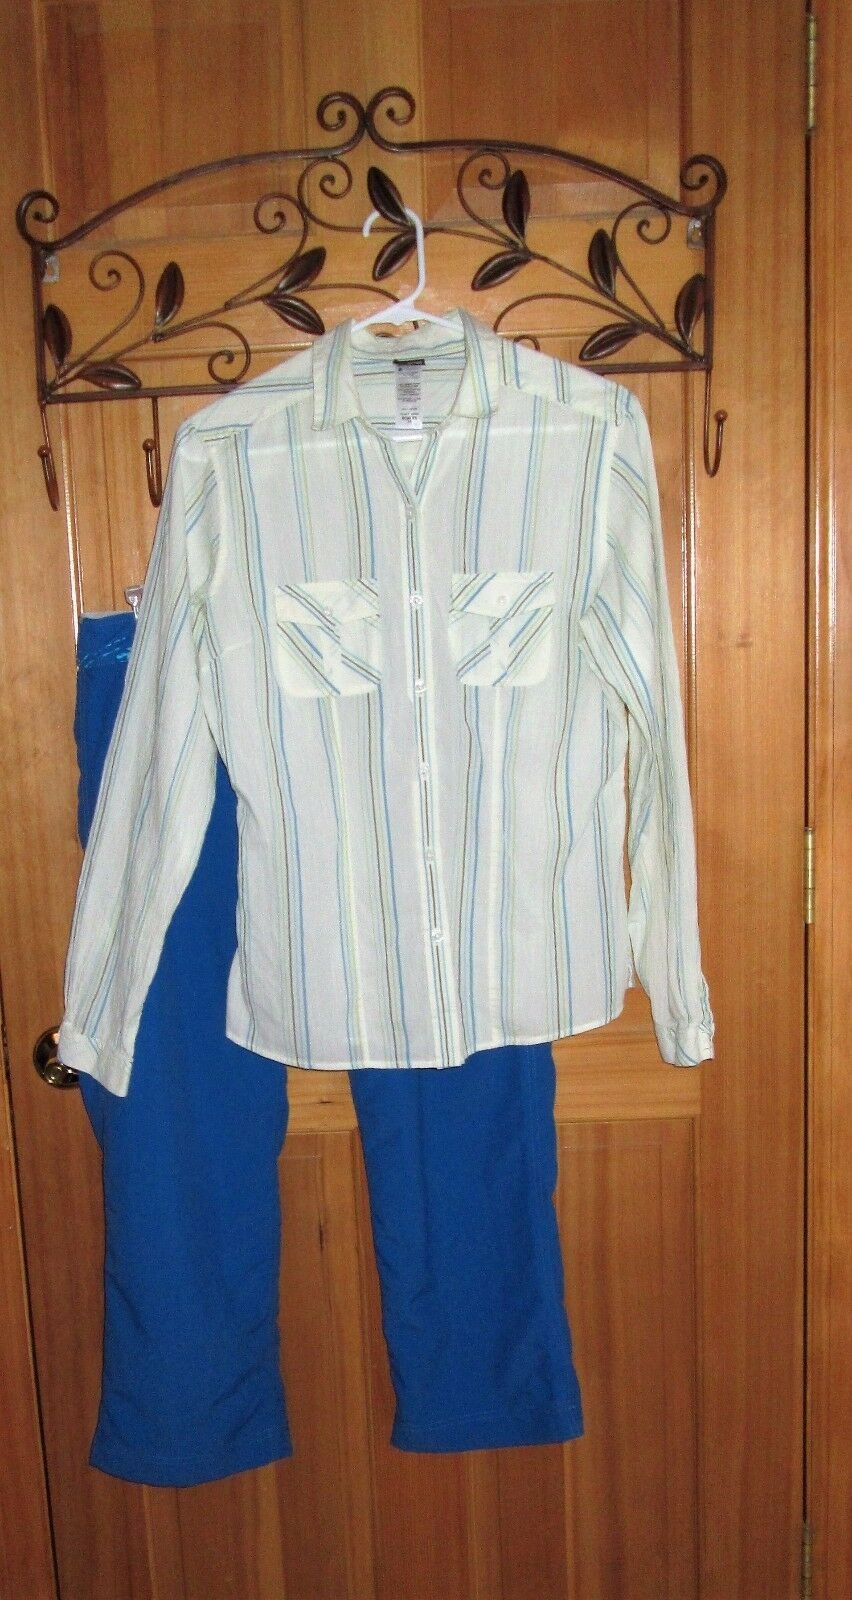 Women's Patagonia Sz.10 long sleeve shirt  & Water Girl by Patagonia bluee capris